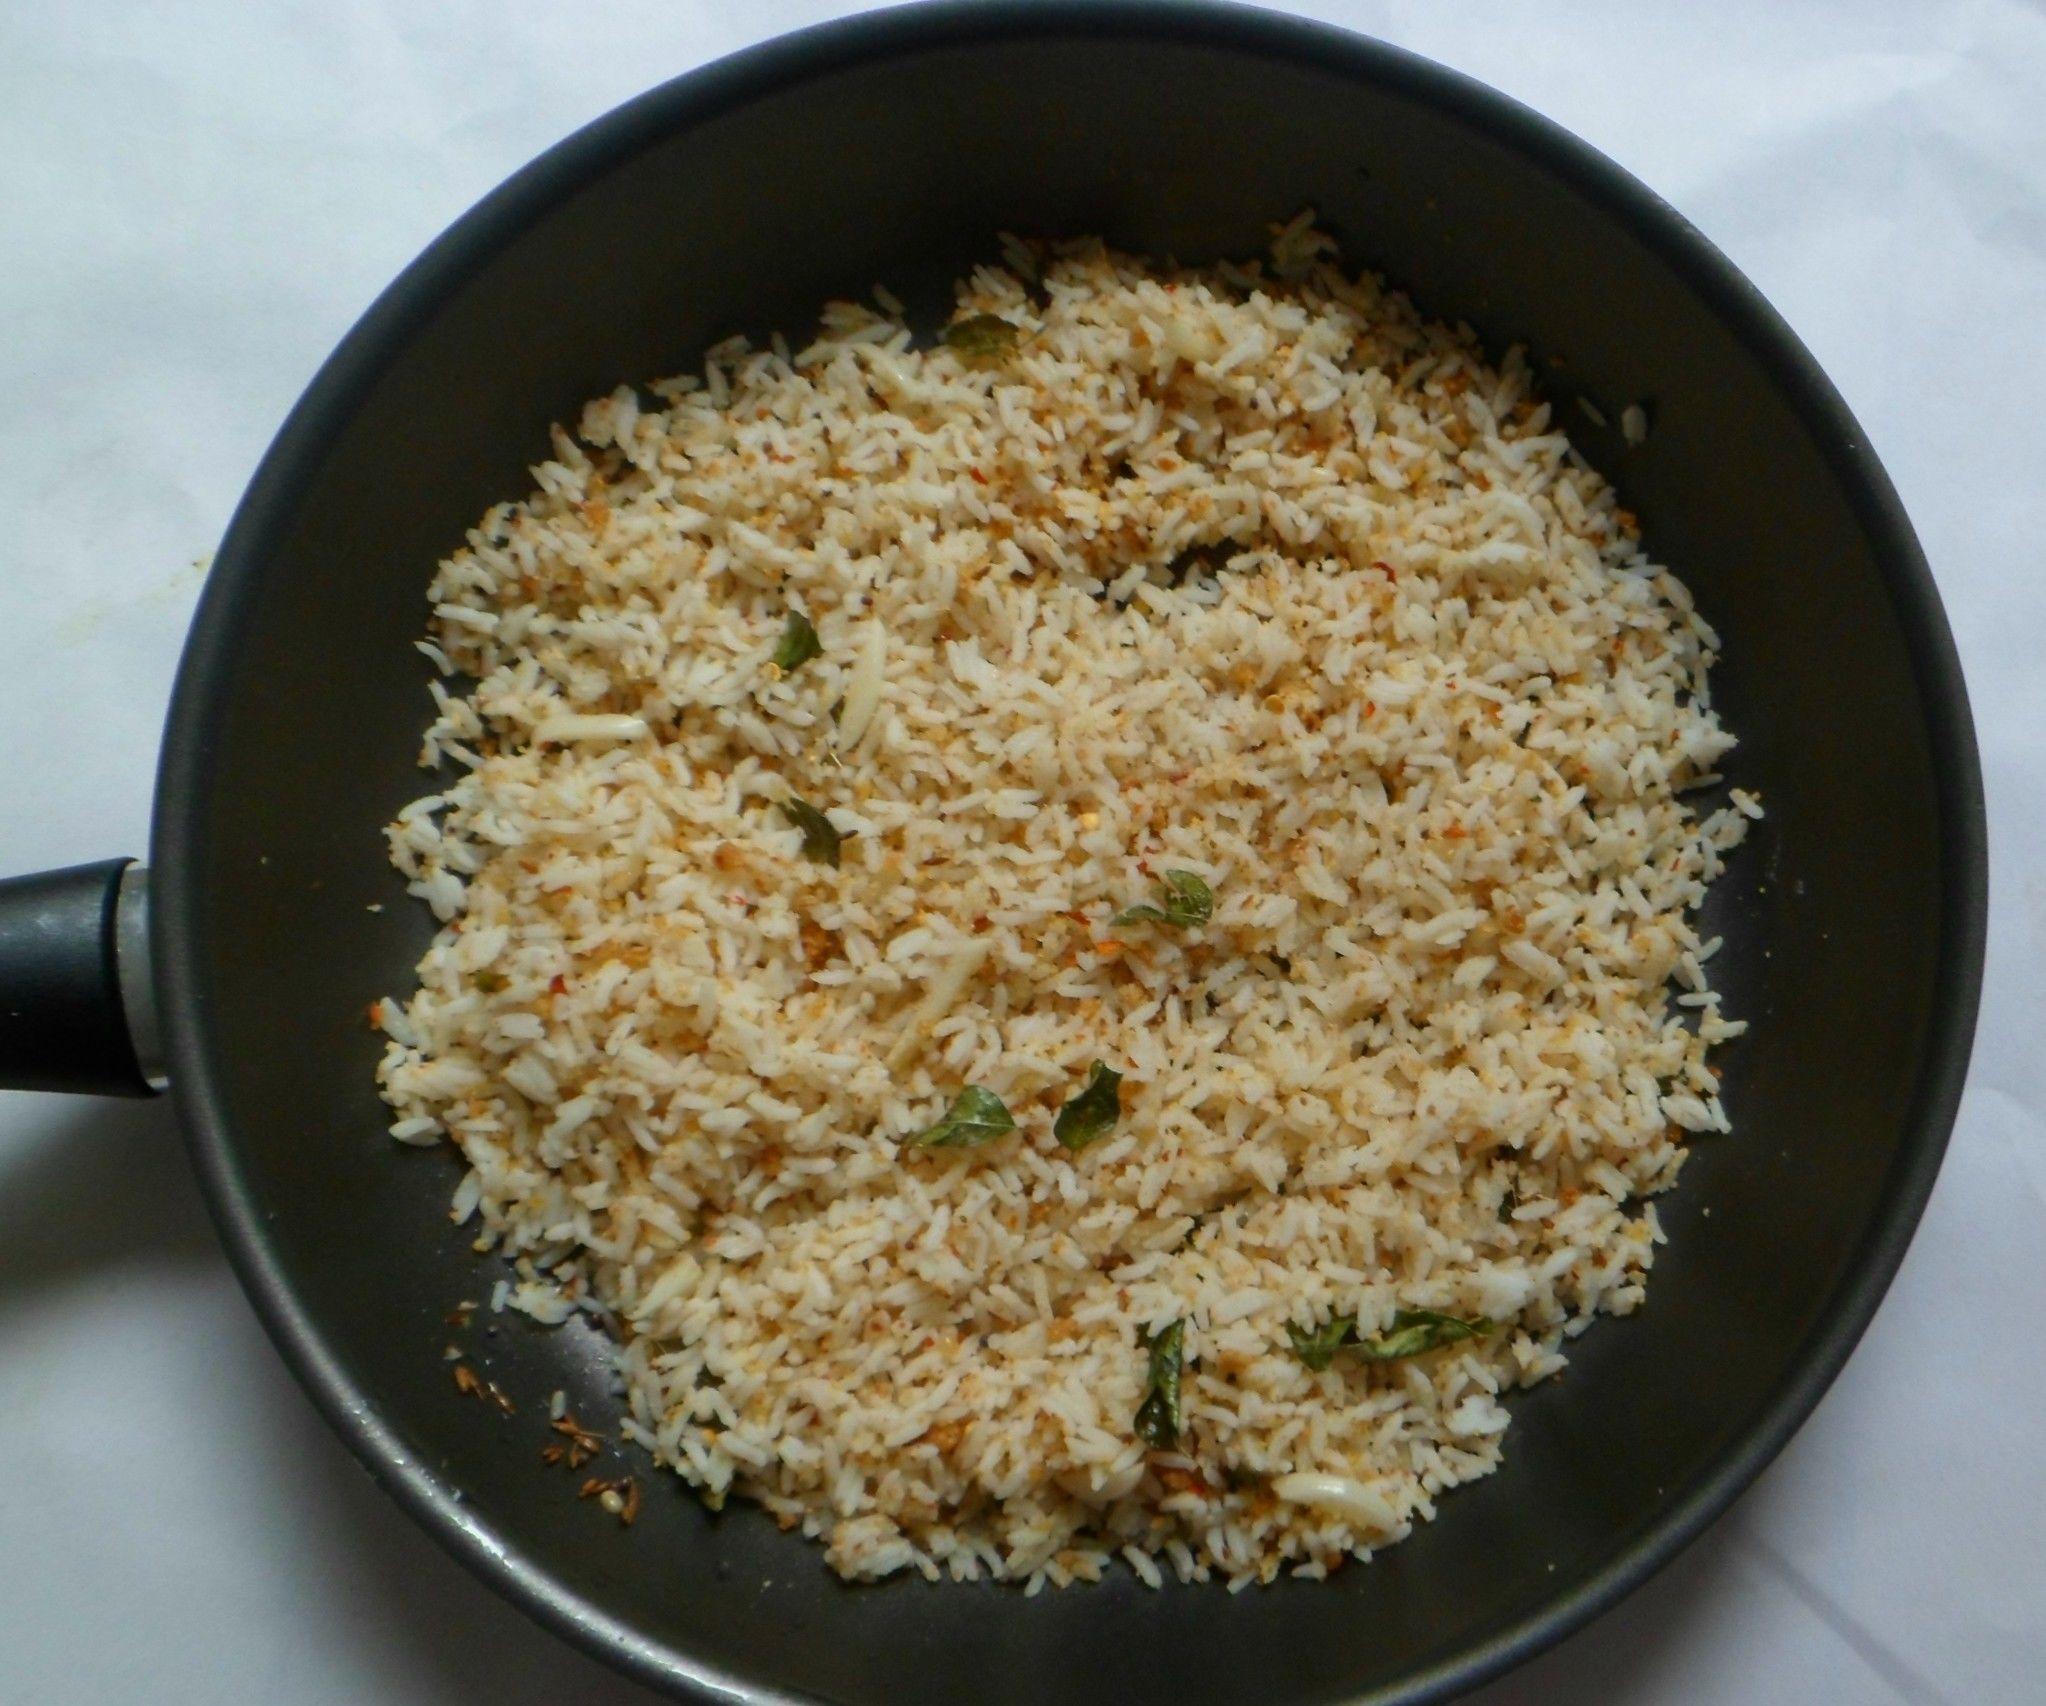 Garlic Rice With Lentil Spice Powder